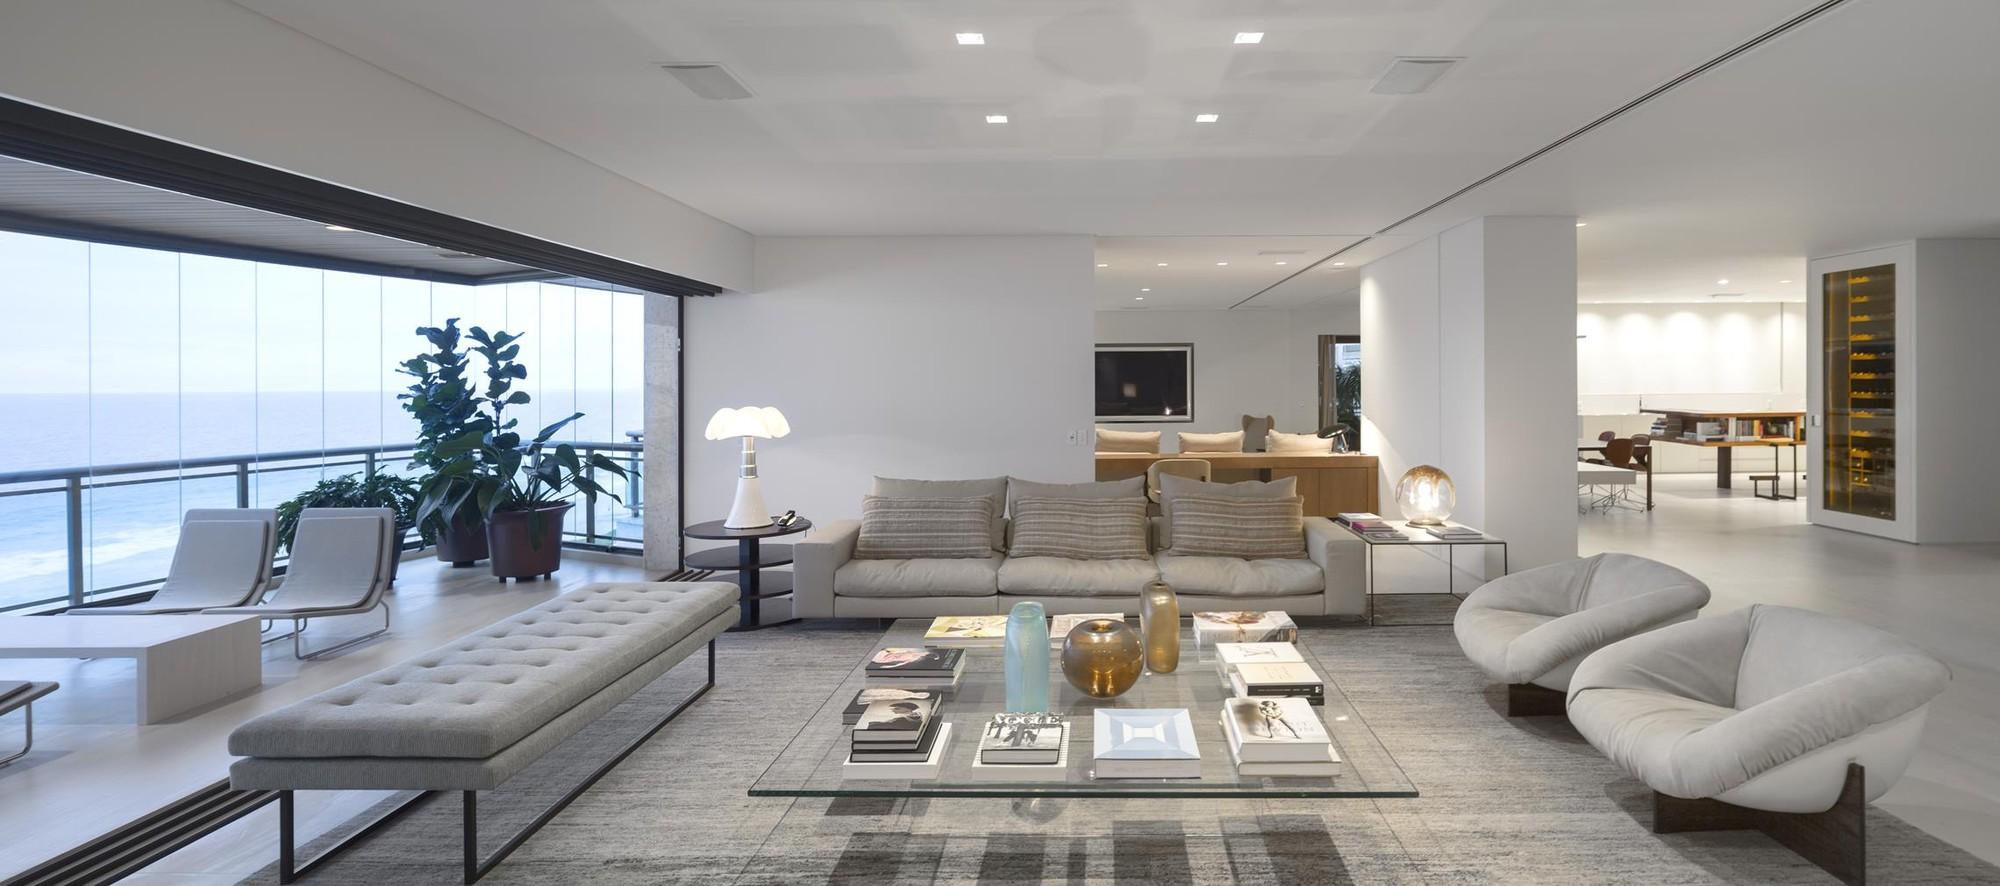 Galeria de Apartamento GN / Studio Arthur Casas - 14